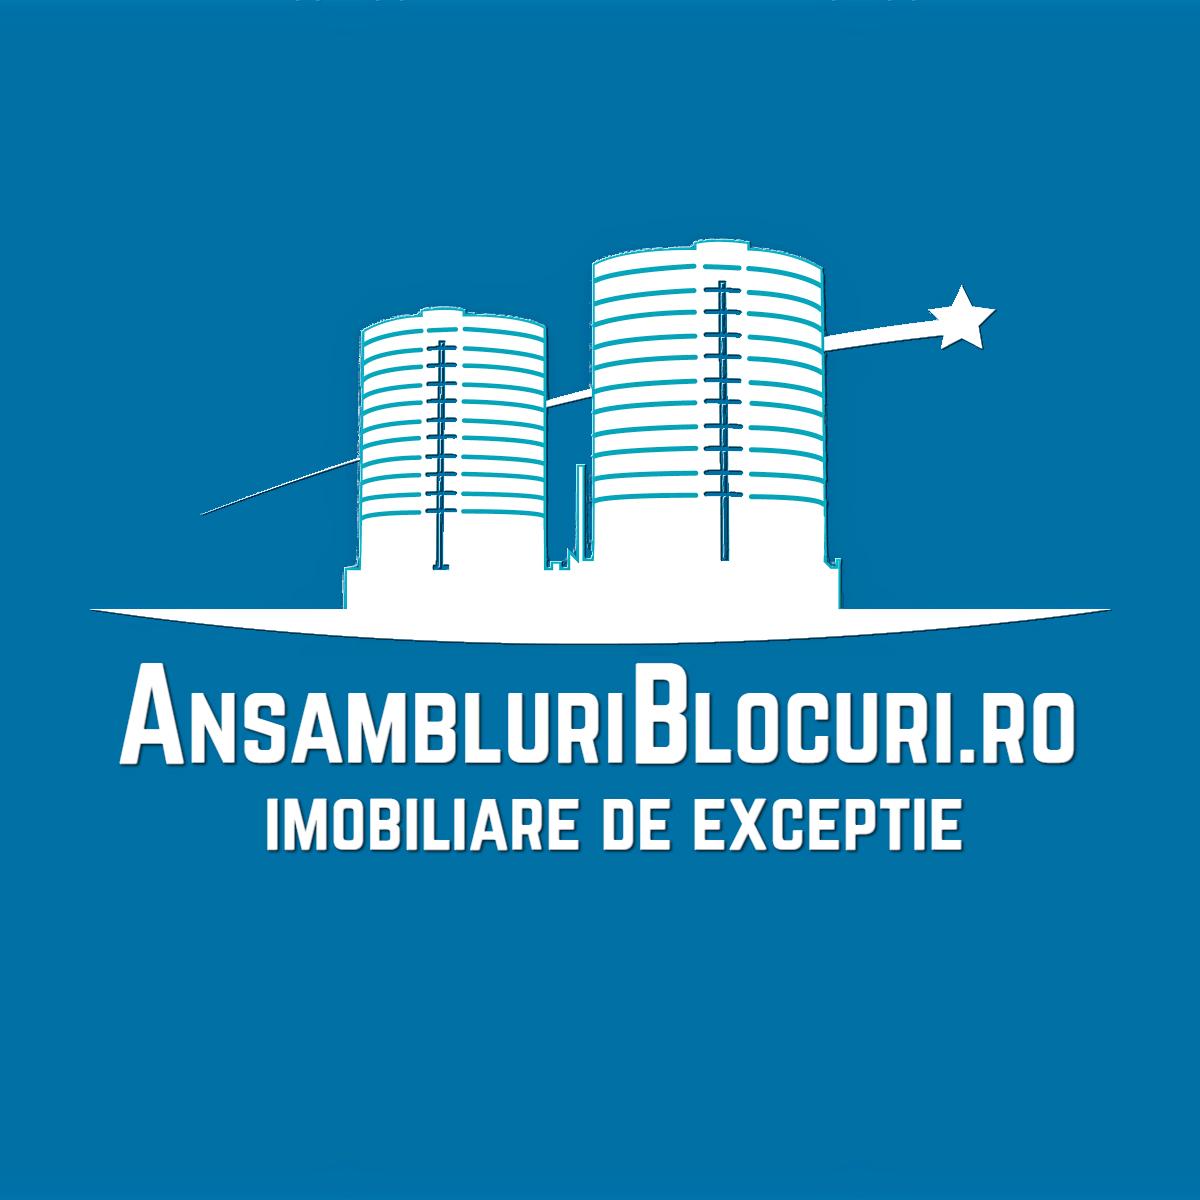 AnsambluriBlocuri.ro - imobiliare de exceptie